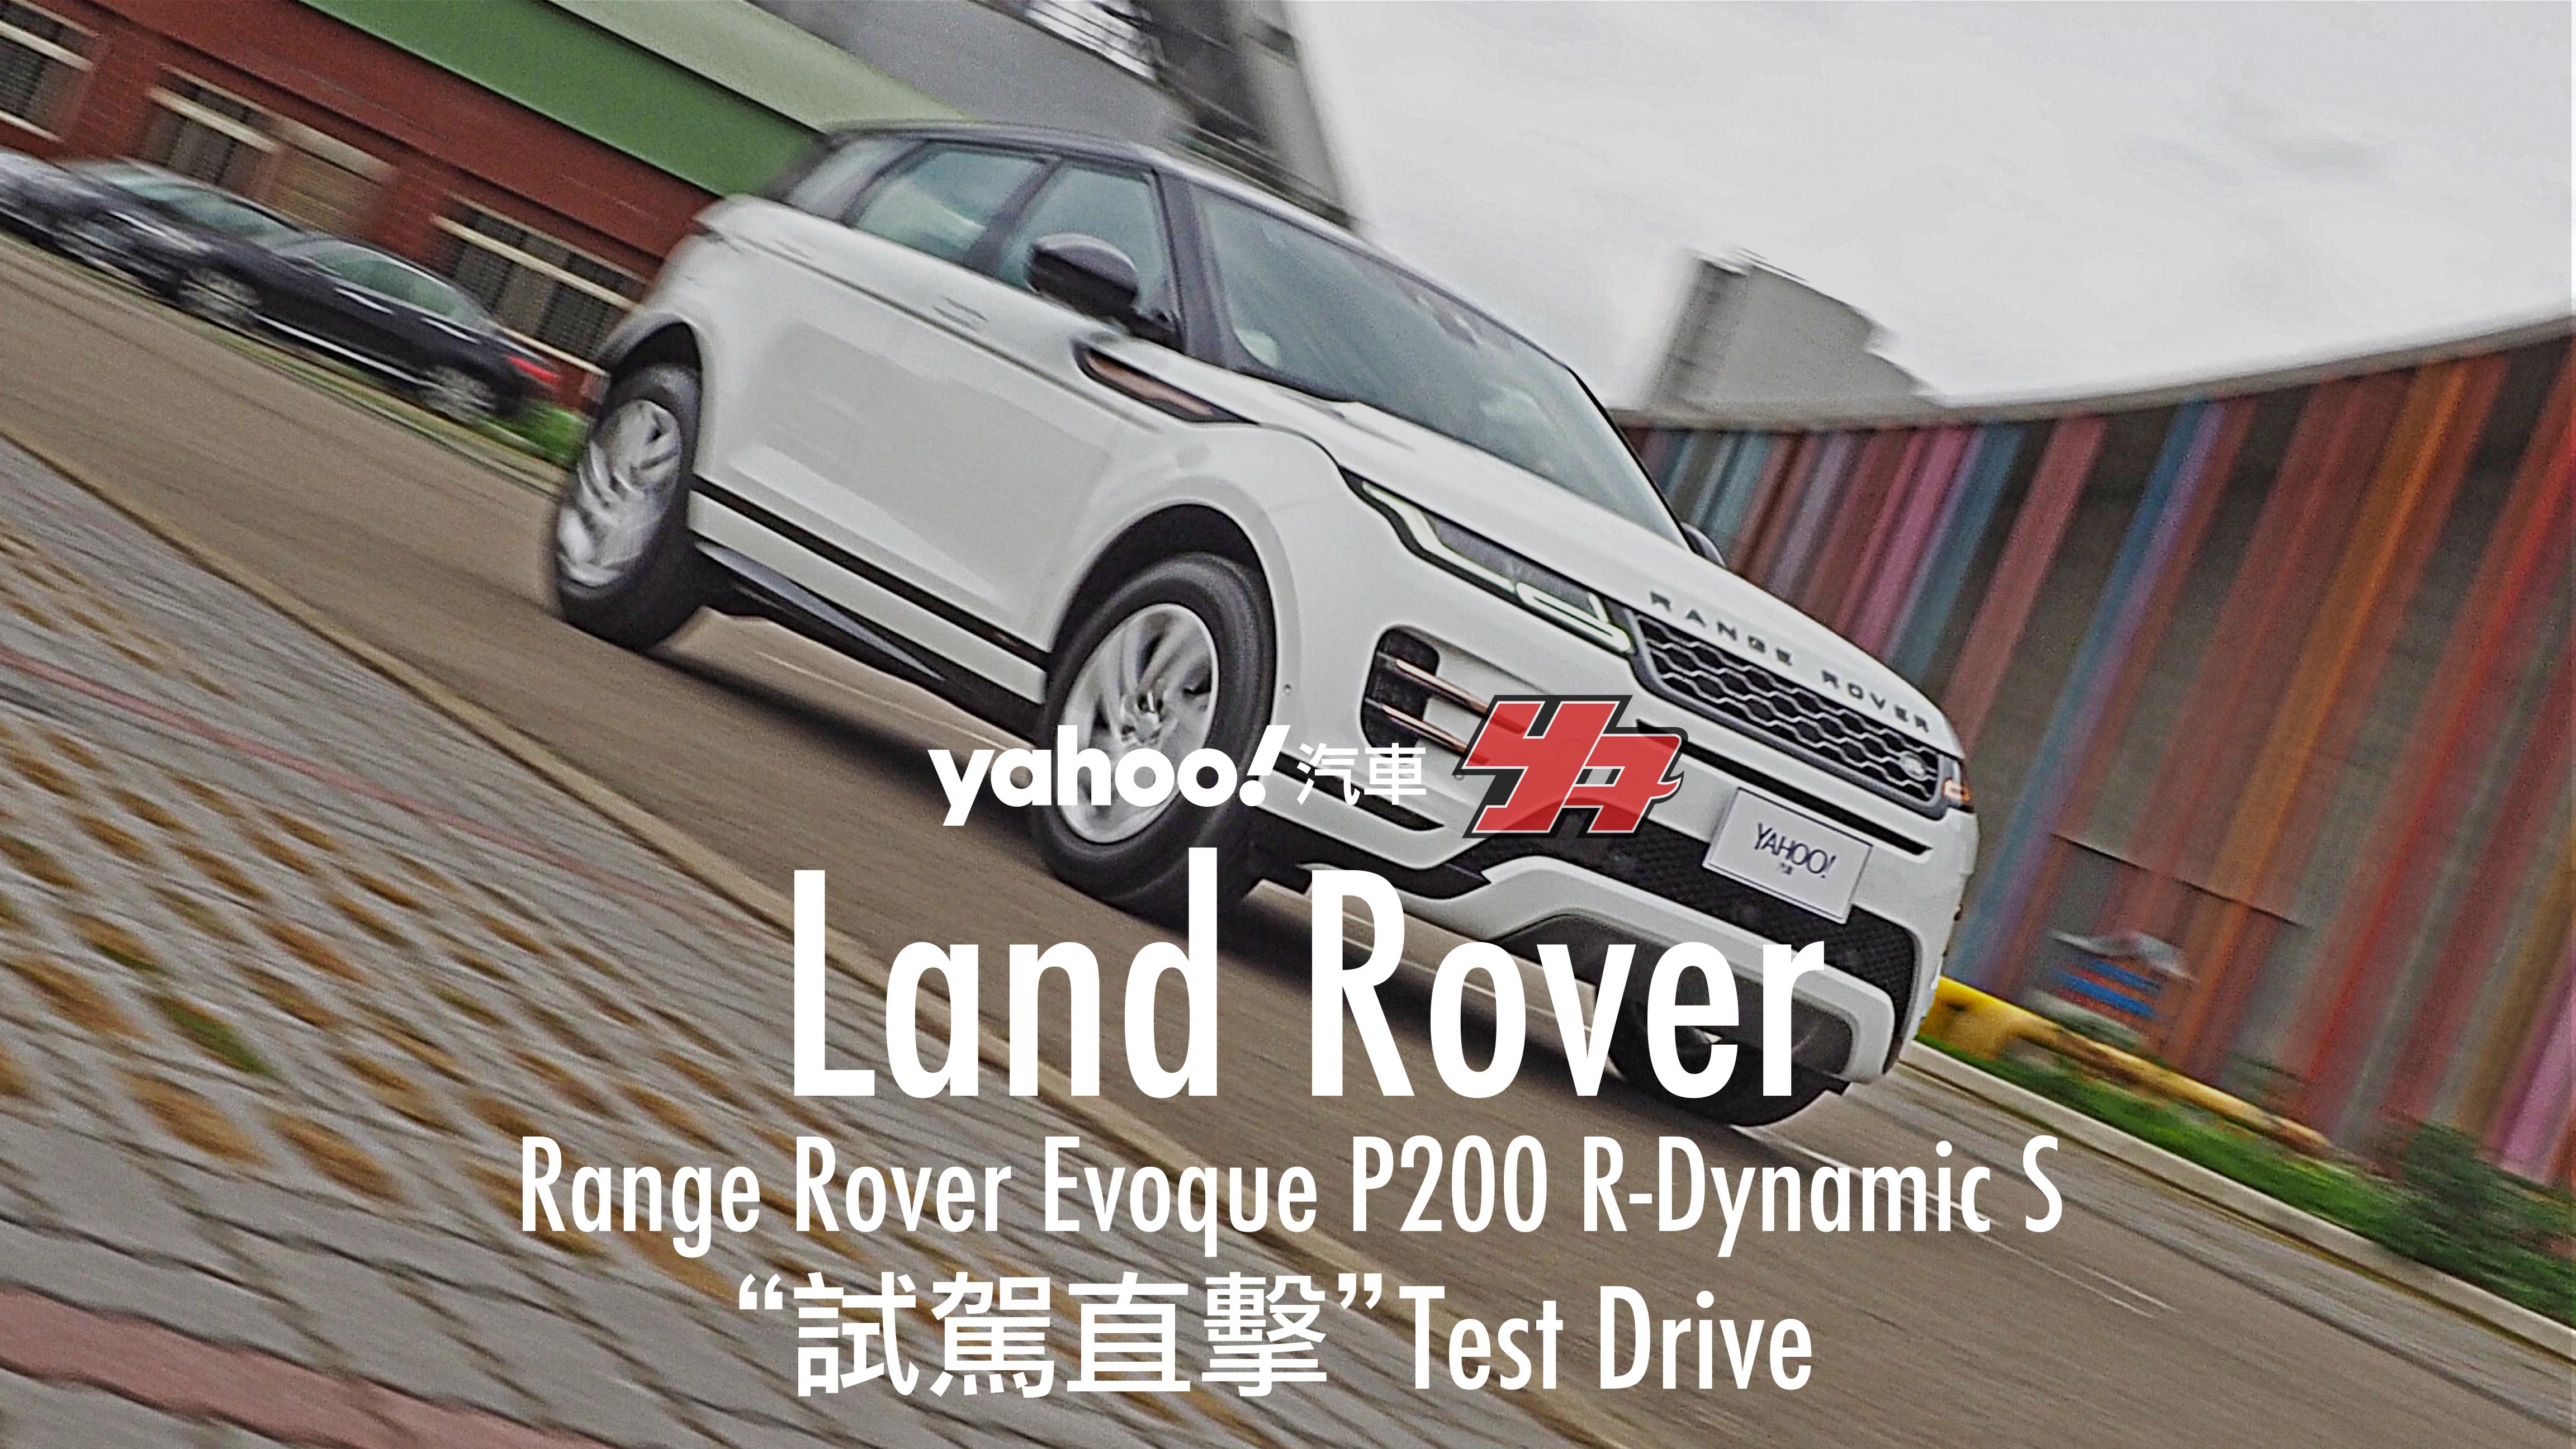 【試駕直擊】變得靦腆但實力不減!2020 Land Rover Range Rover Evoque P200 R-Dynamic S試駕